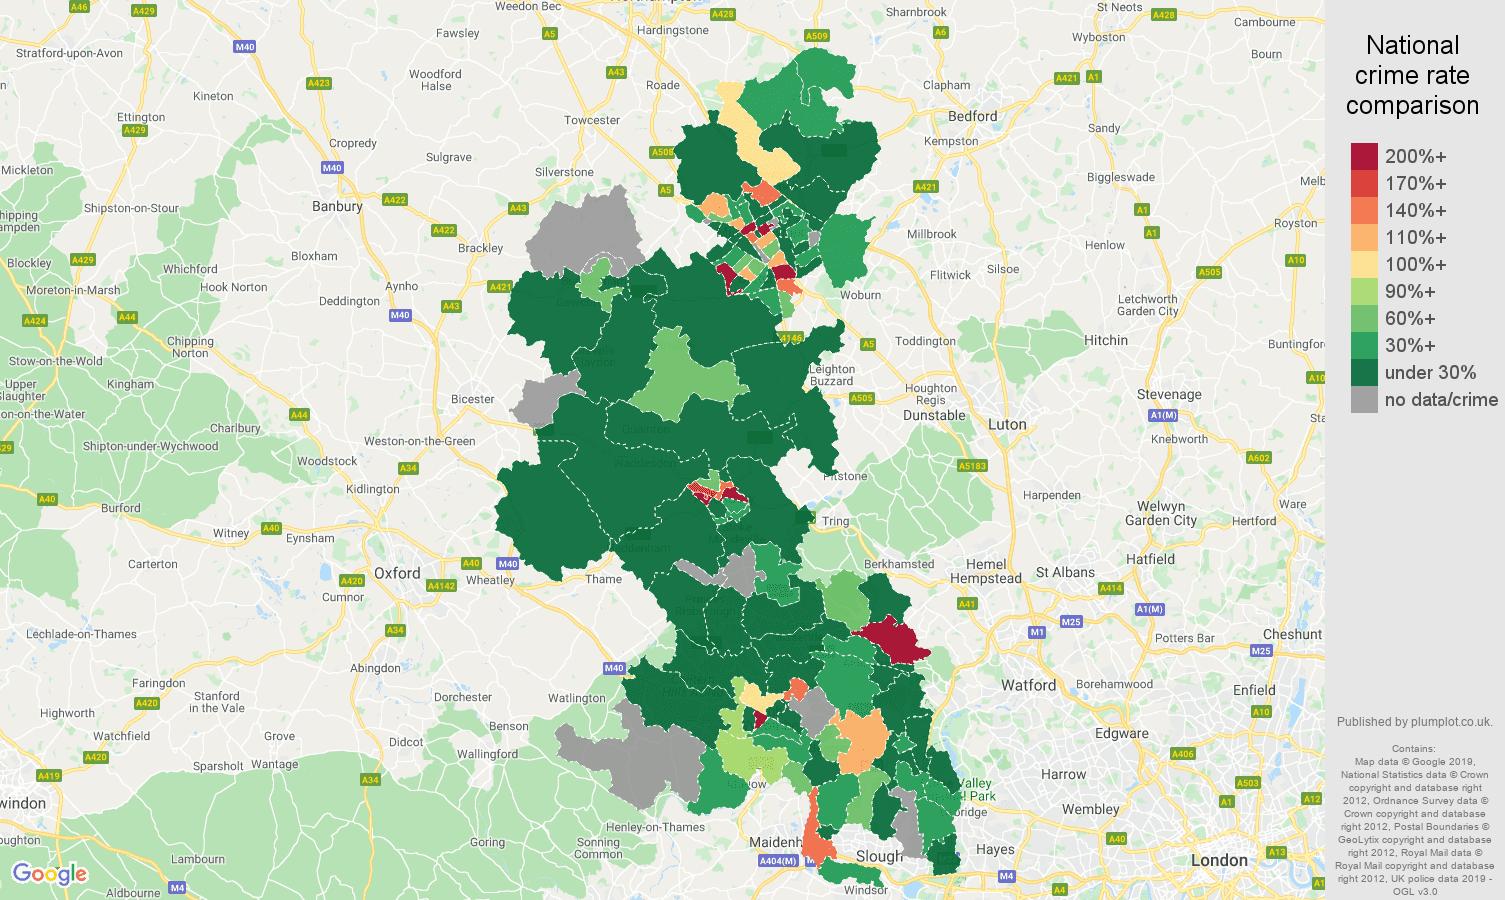 Buckinghamshire shoplifting crime rate comparison map